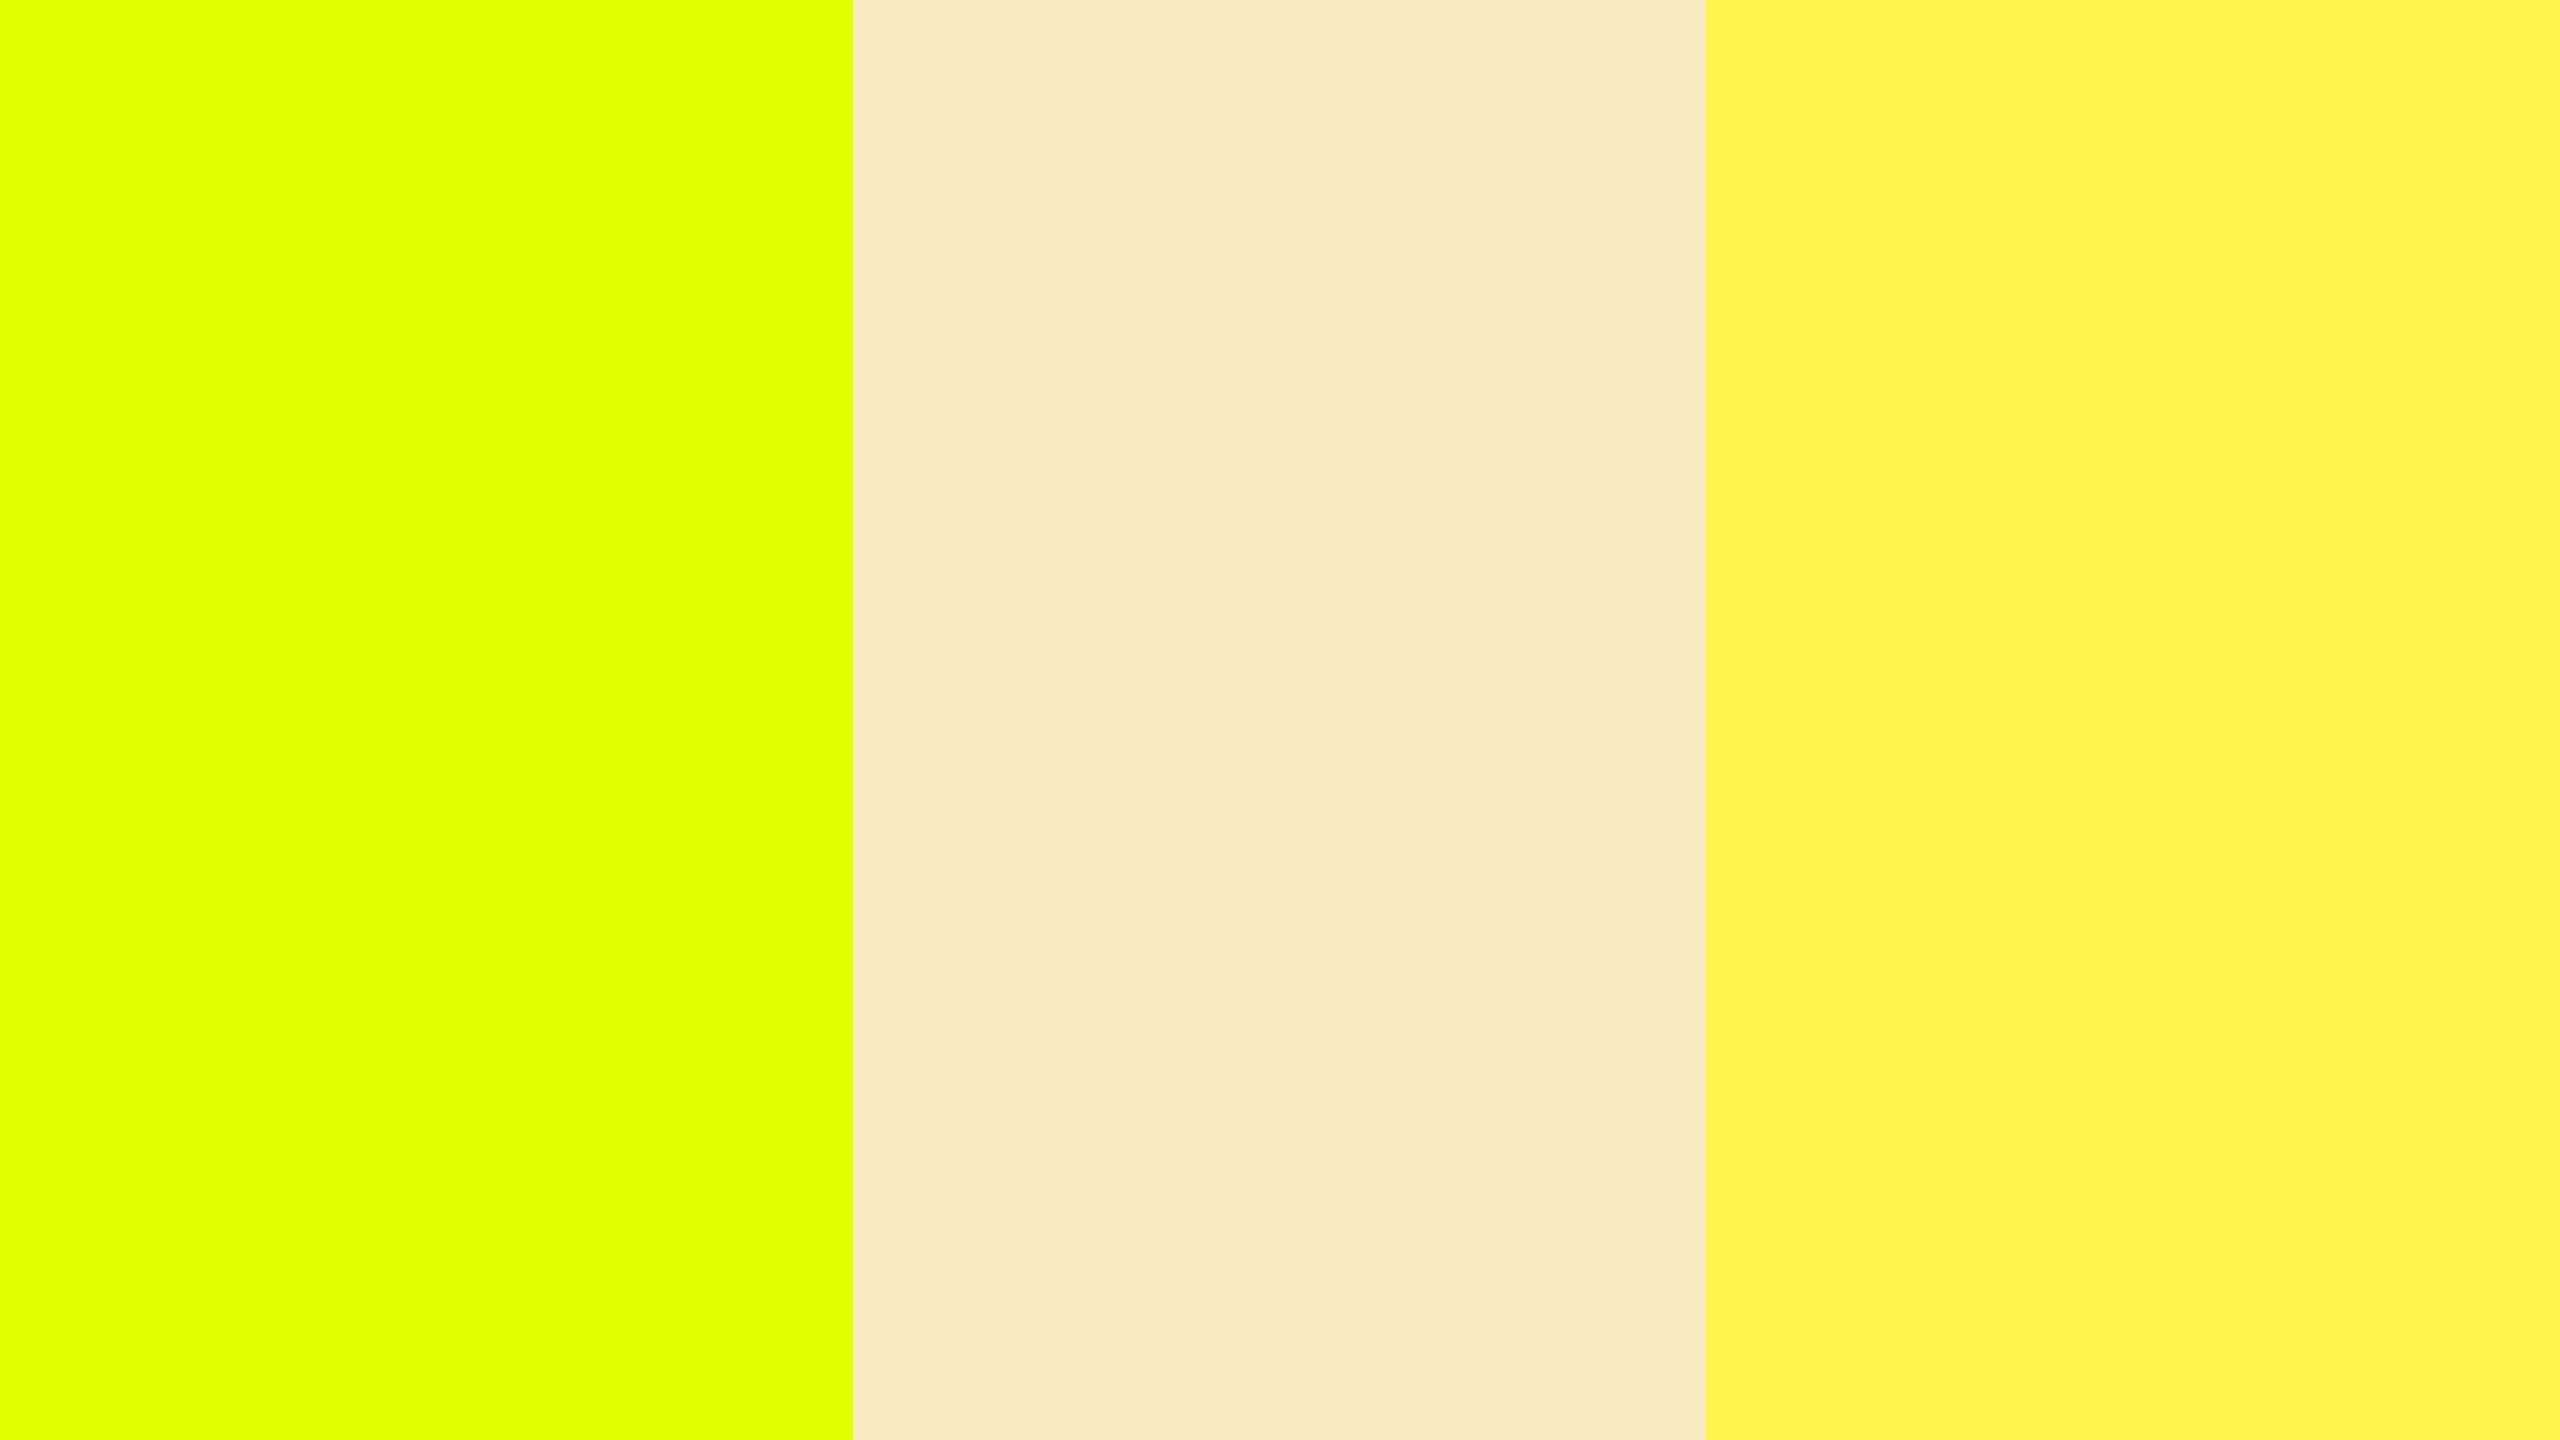 Yellow Lemon Code Color